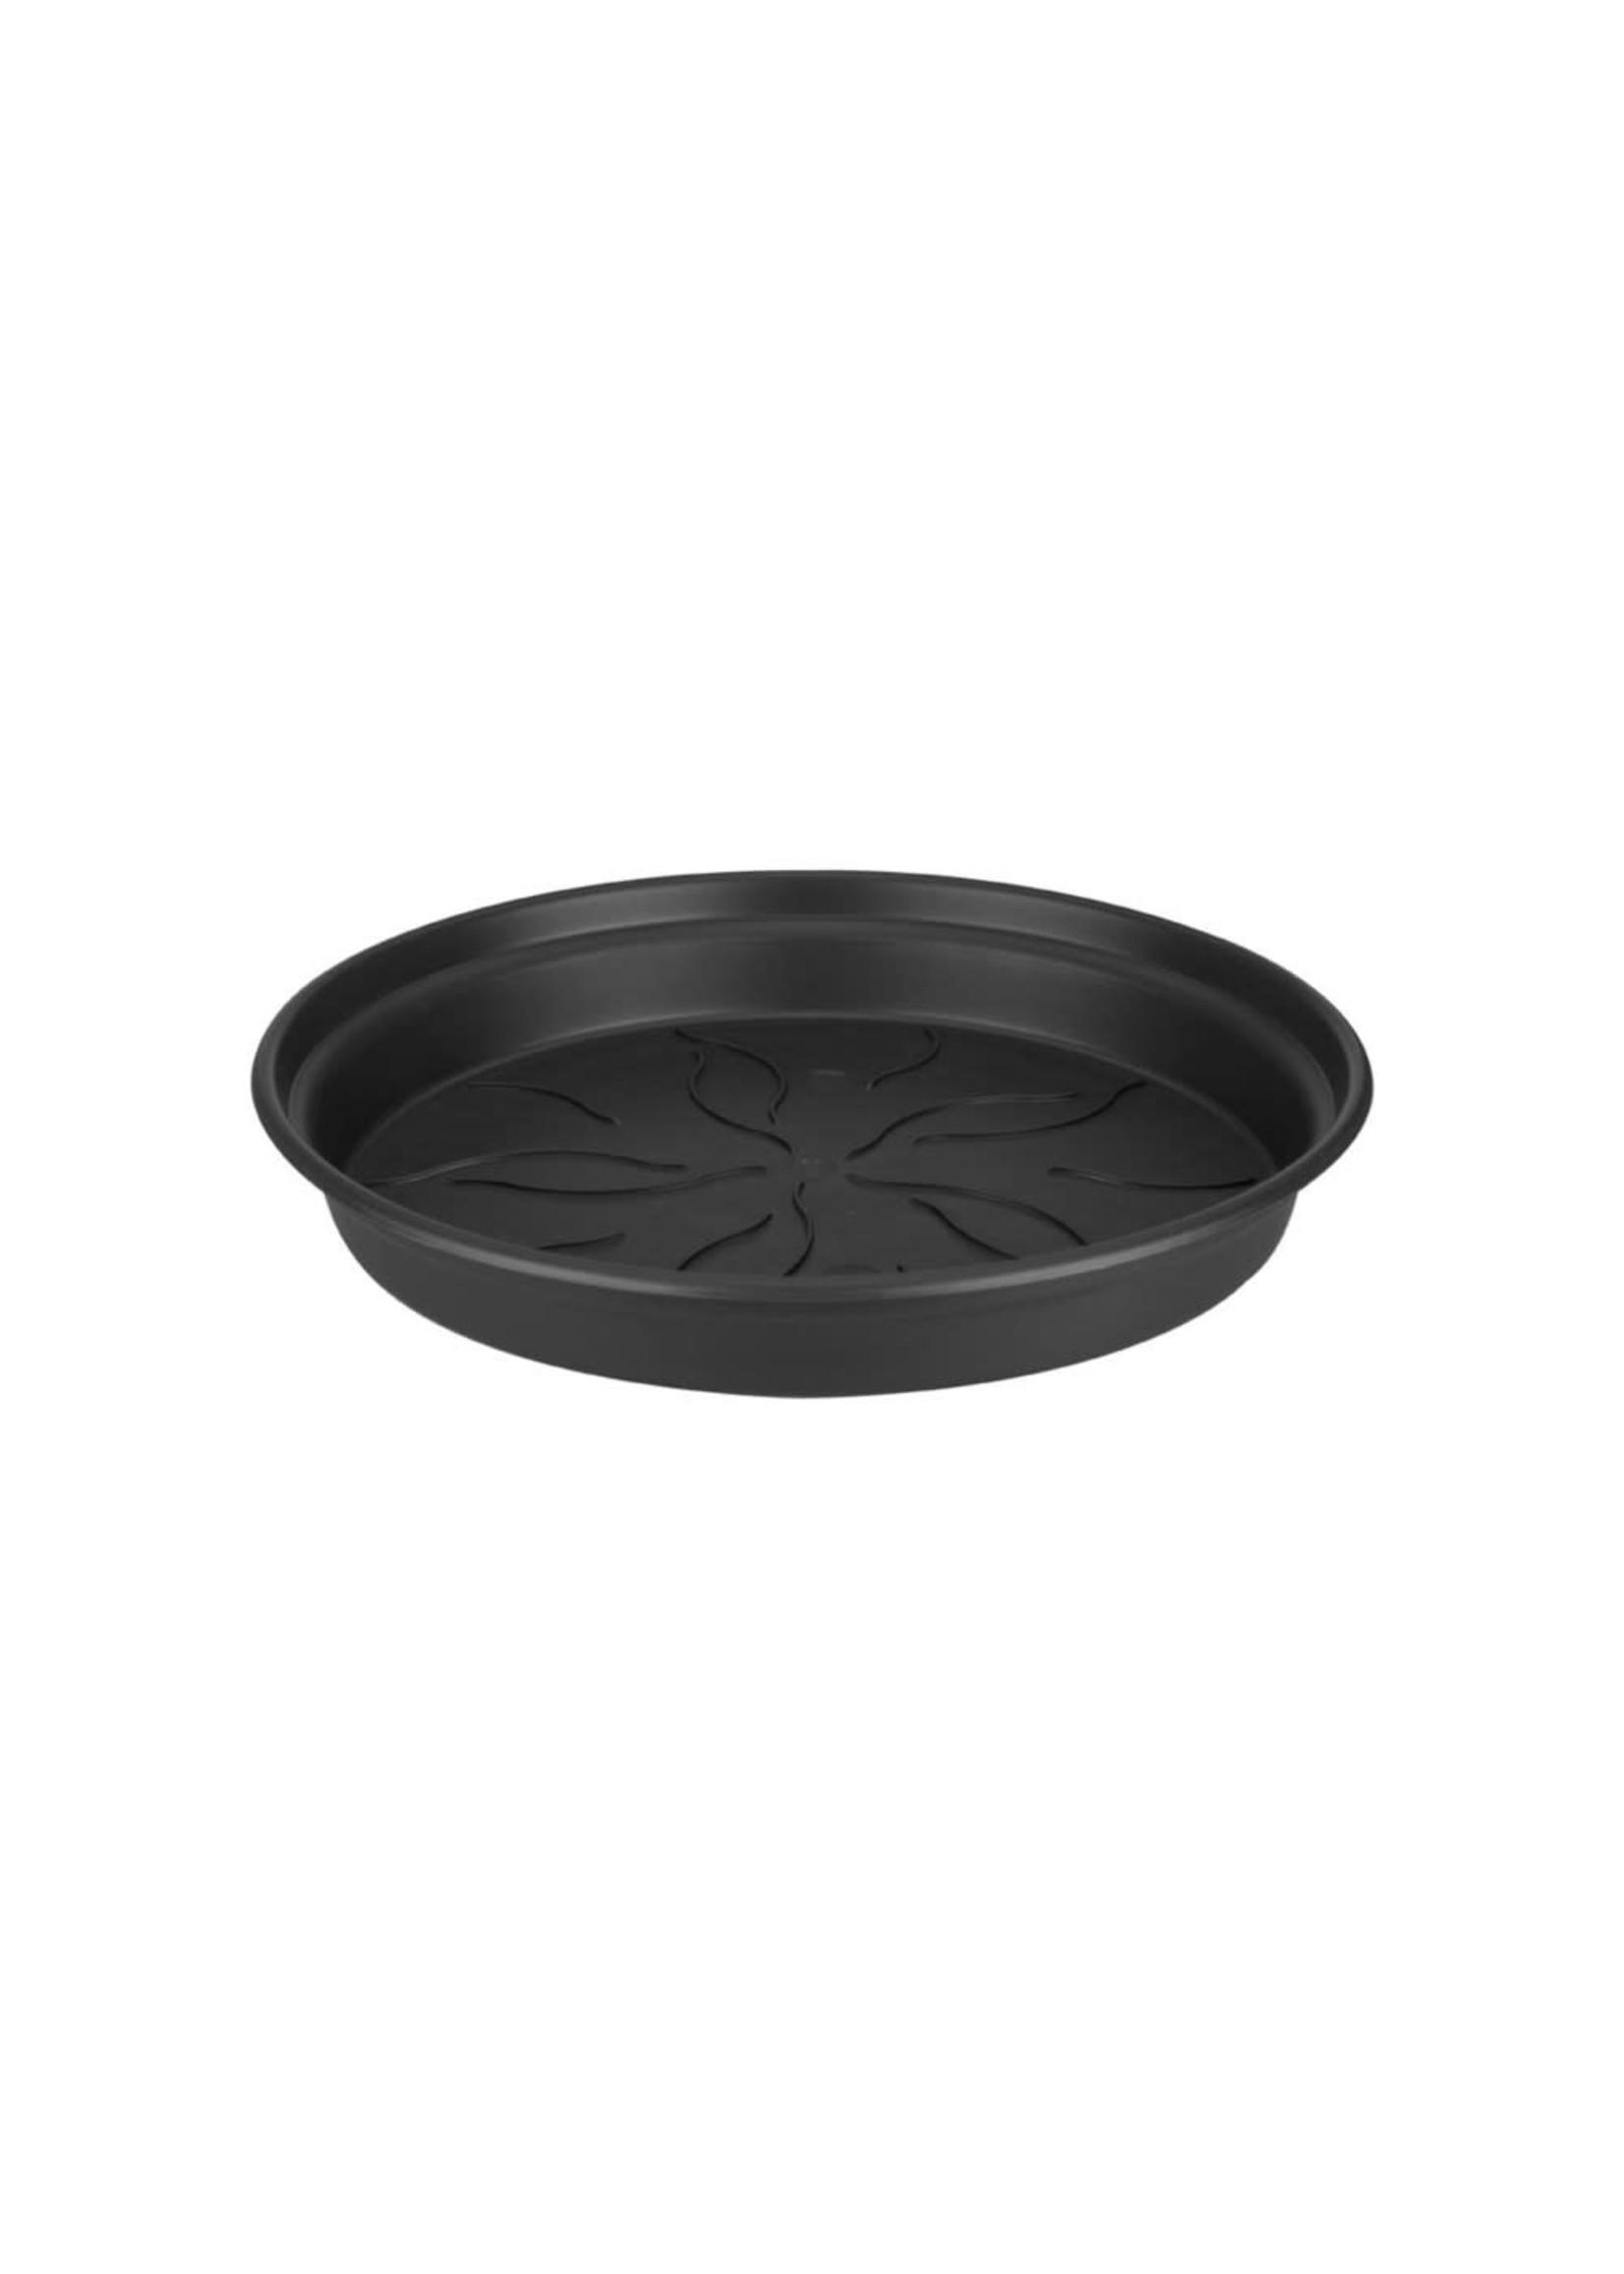 Elho Green Basics saucer 25cm Black